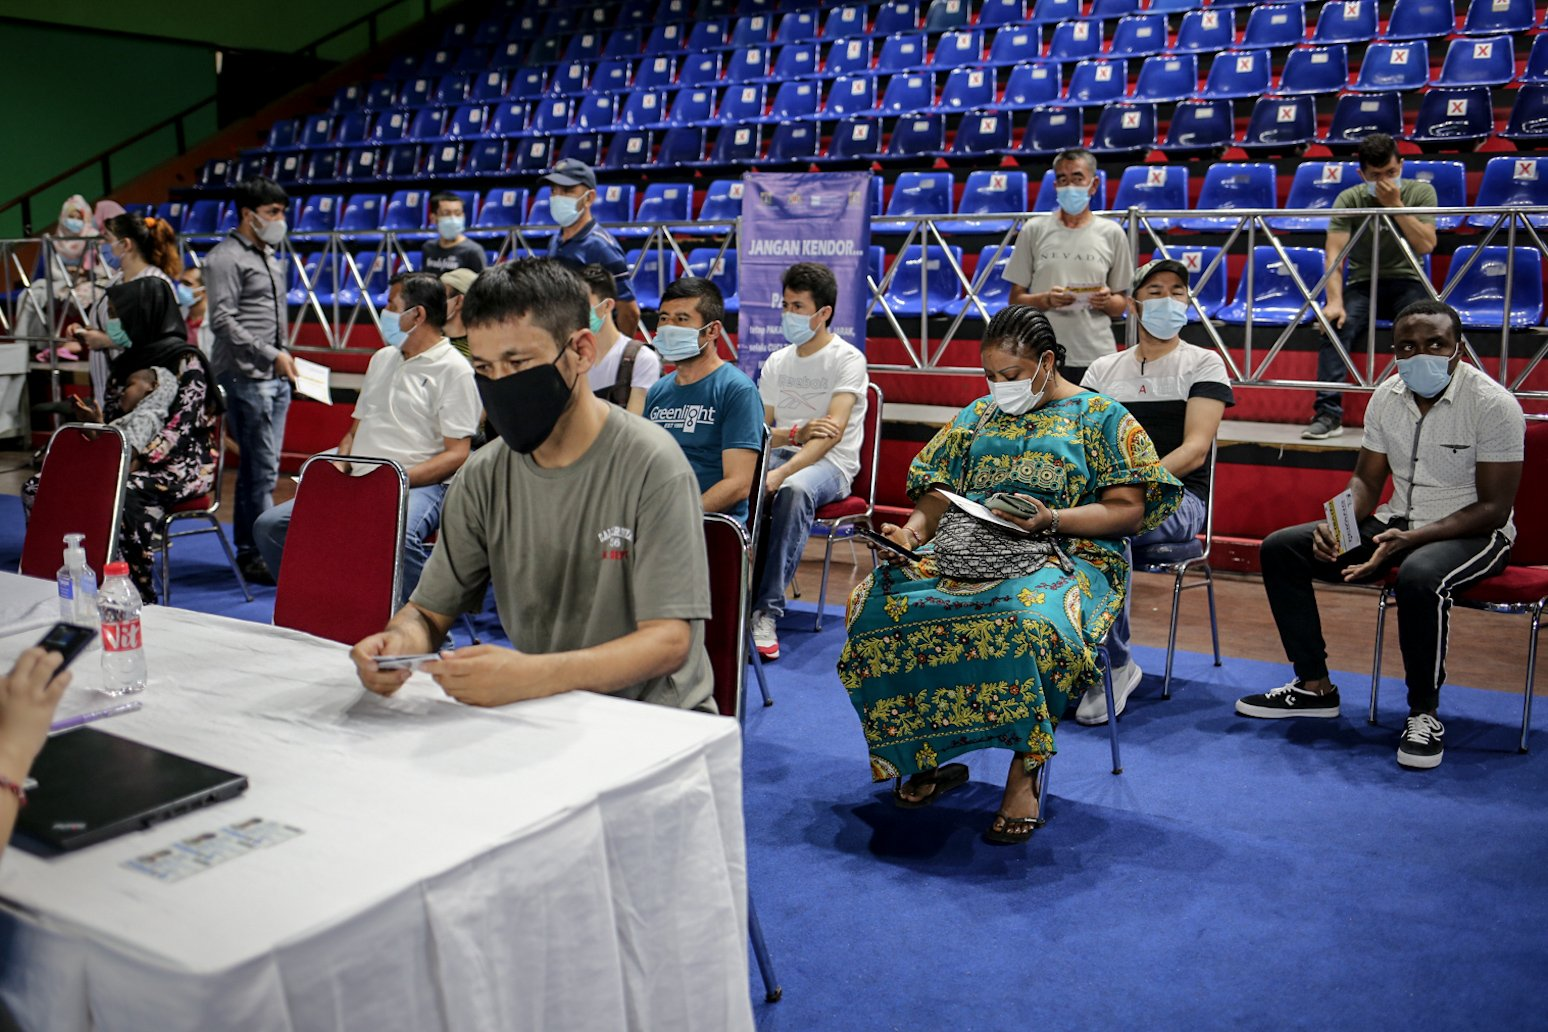 Pencari suaka berbaris antre melakukan skrining untuk mengikuti vaksinasi COVID-19 di GOR Bulungan, Jakarta Selatan, Kamis (7/10/2021). \r\nVaksinasi tersebut digelar atas kerja sama Pemprov DKI Jakarta, UNHCR dan Kadin Indonesia. \r\nSebanyak 600 vaksin dosis pertama disediakan dalam vaksinasi tersebut.